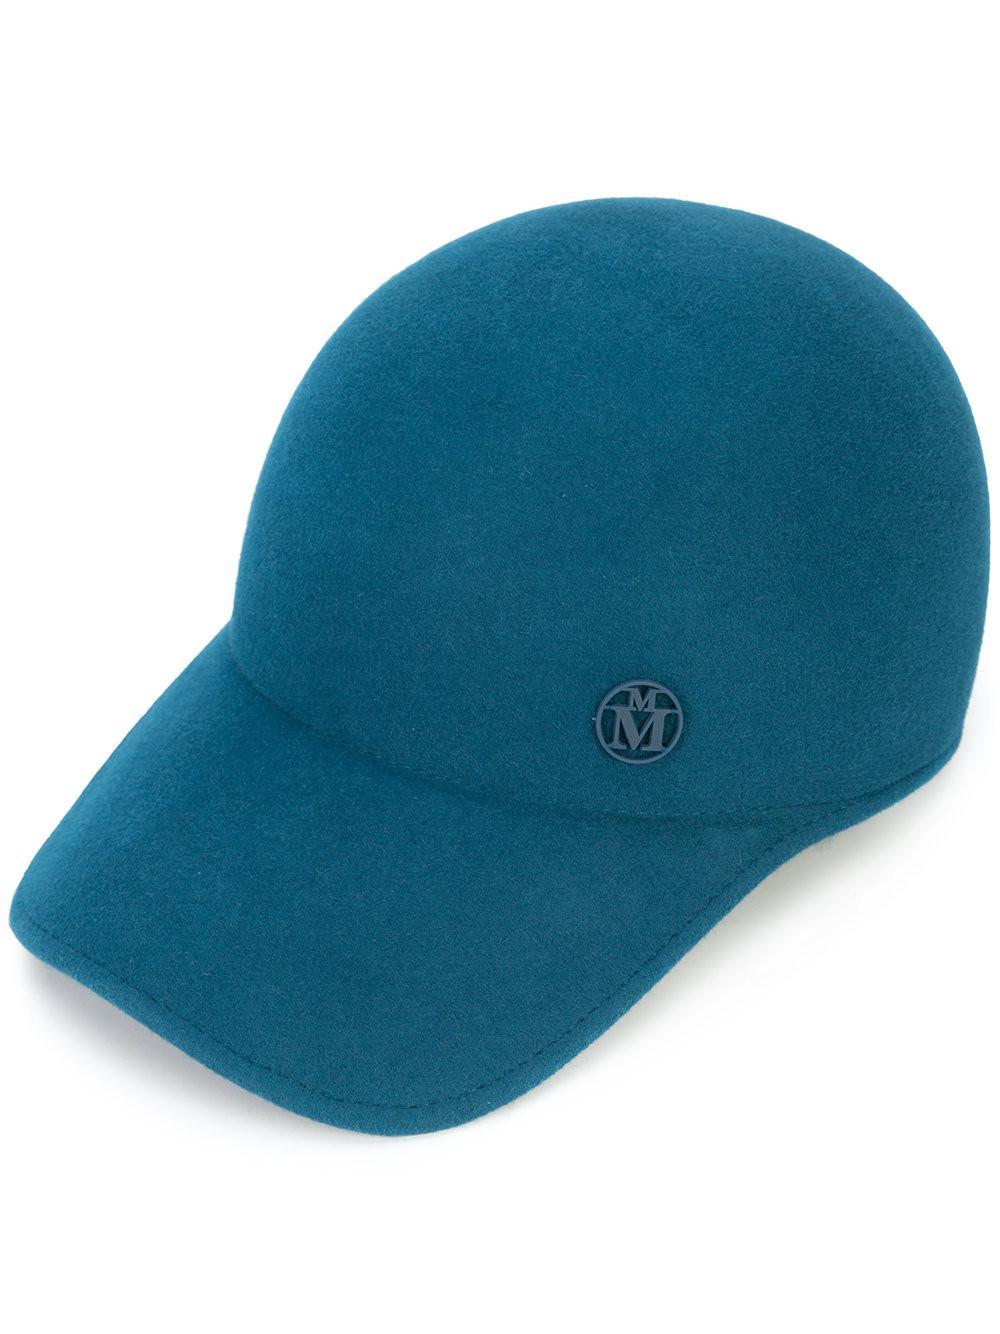 c3dac2b414b Maison Michel Classic Baseball Cap in Blue - Save 37.31527093596059 ...